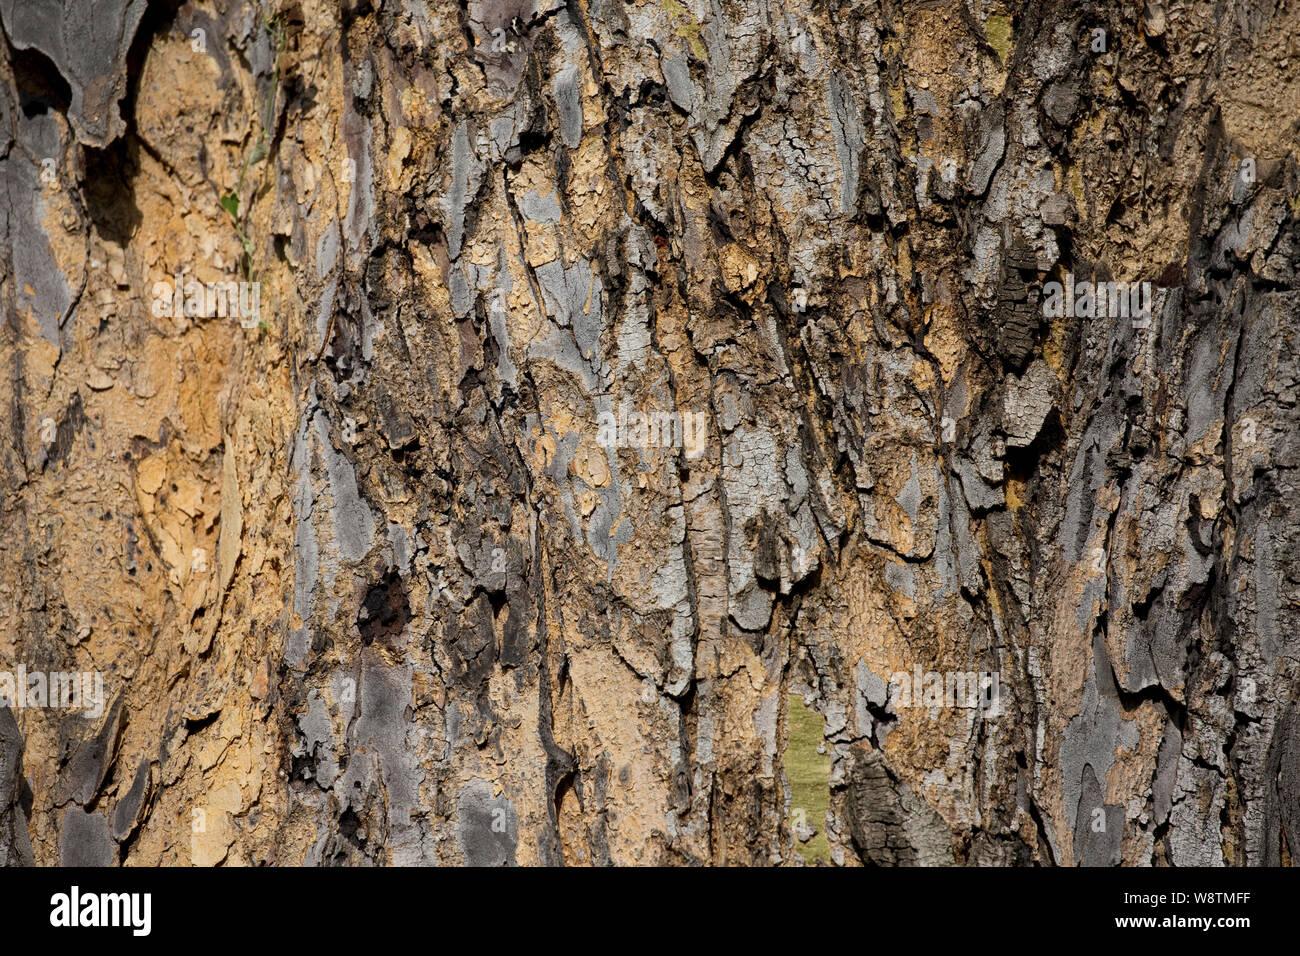 Close up of Acacia bark, suitable for background image, Elsamere, Kenya Stock Photo